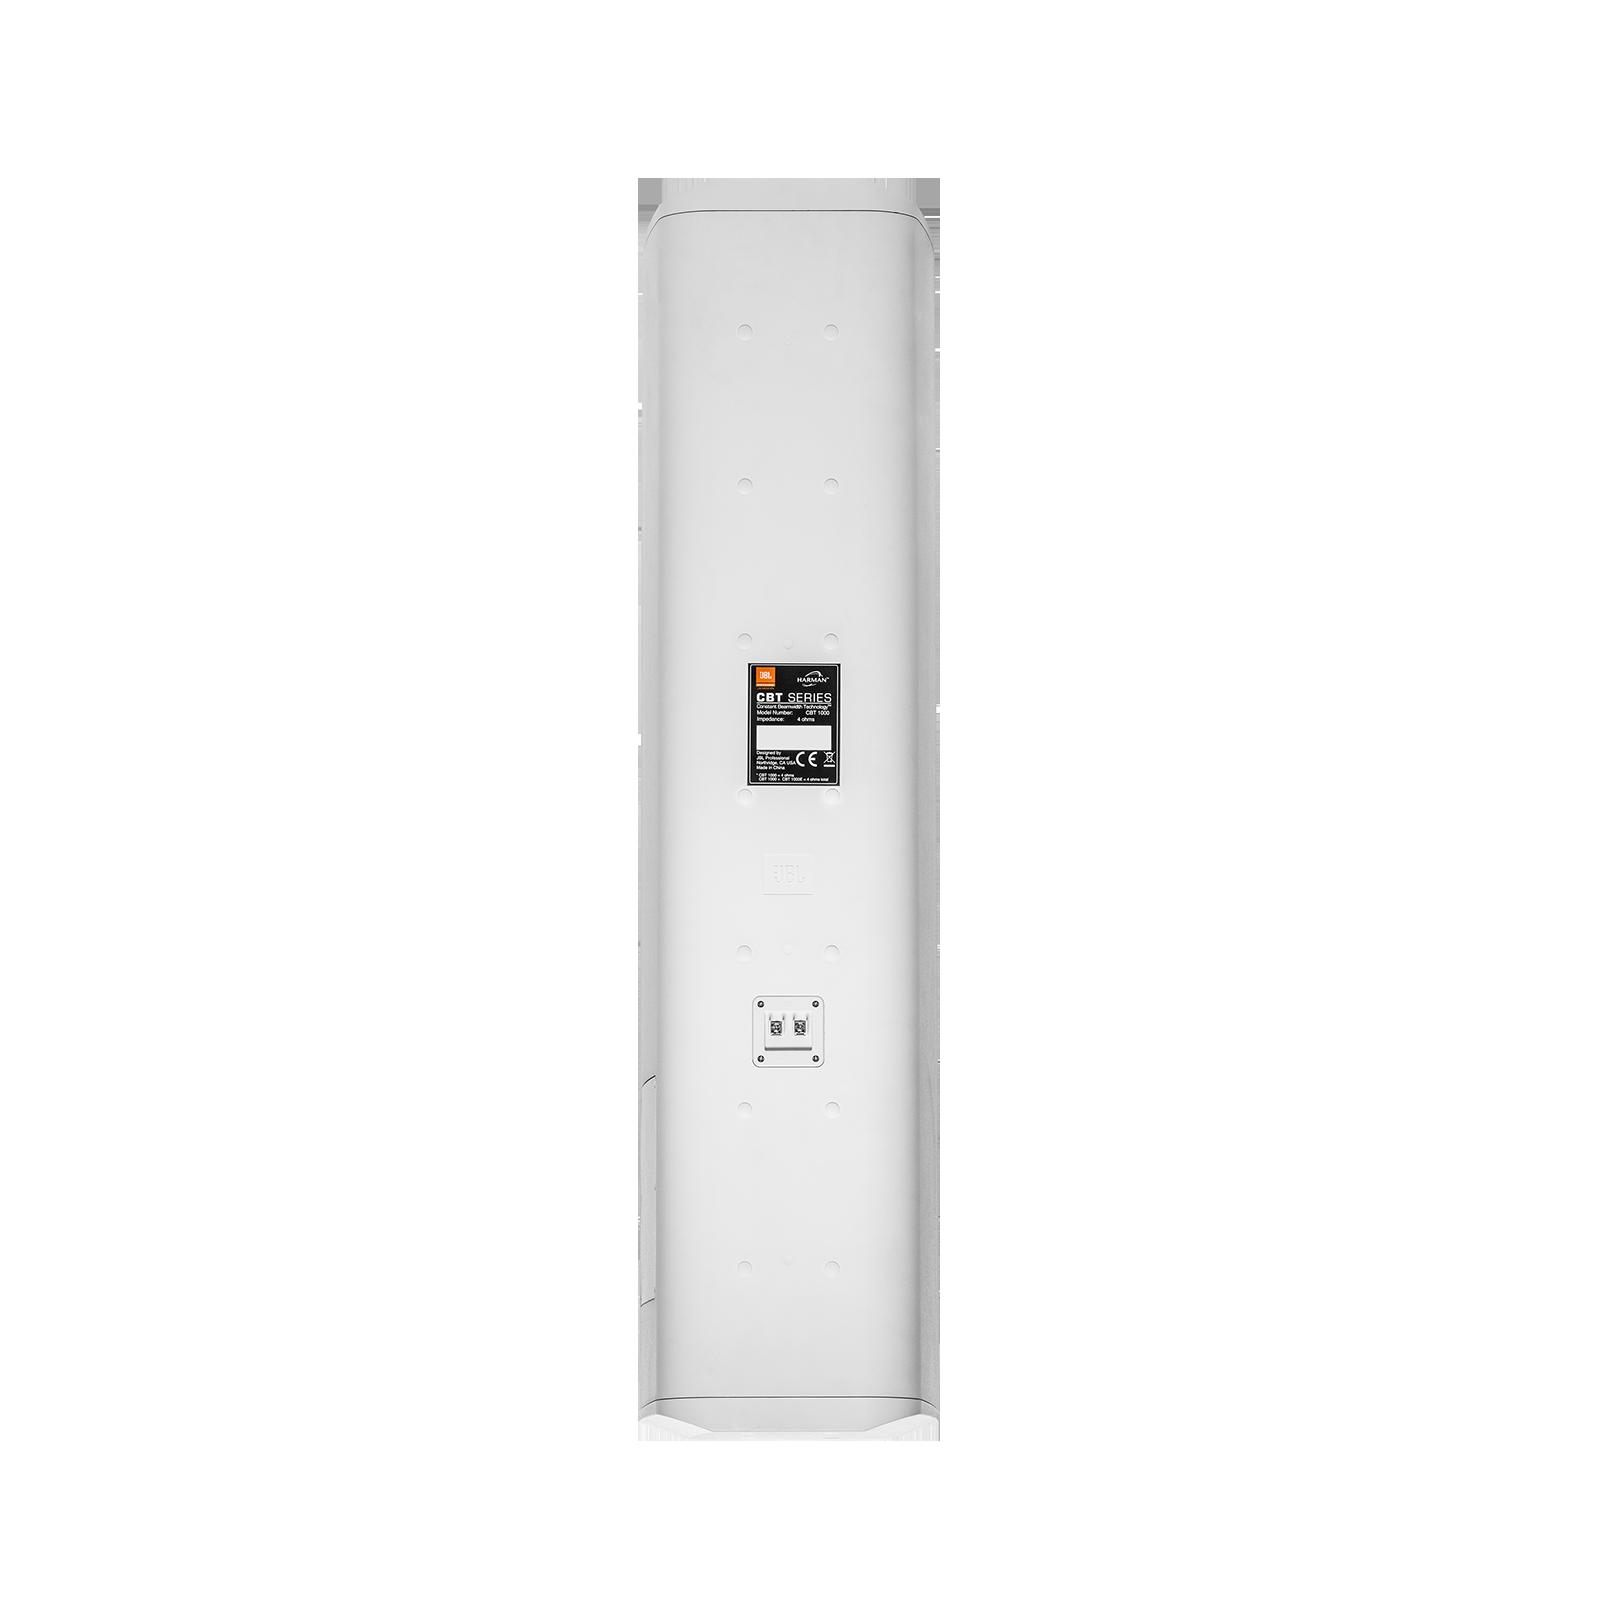 JBL CBT 1000 (B-Stock) - White - Constant Beamwidth Technology ™ Adjustable Coverage Line Array Column - Back